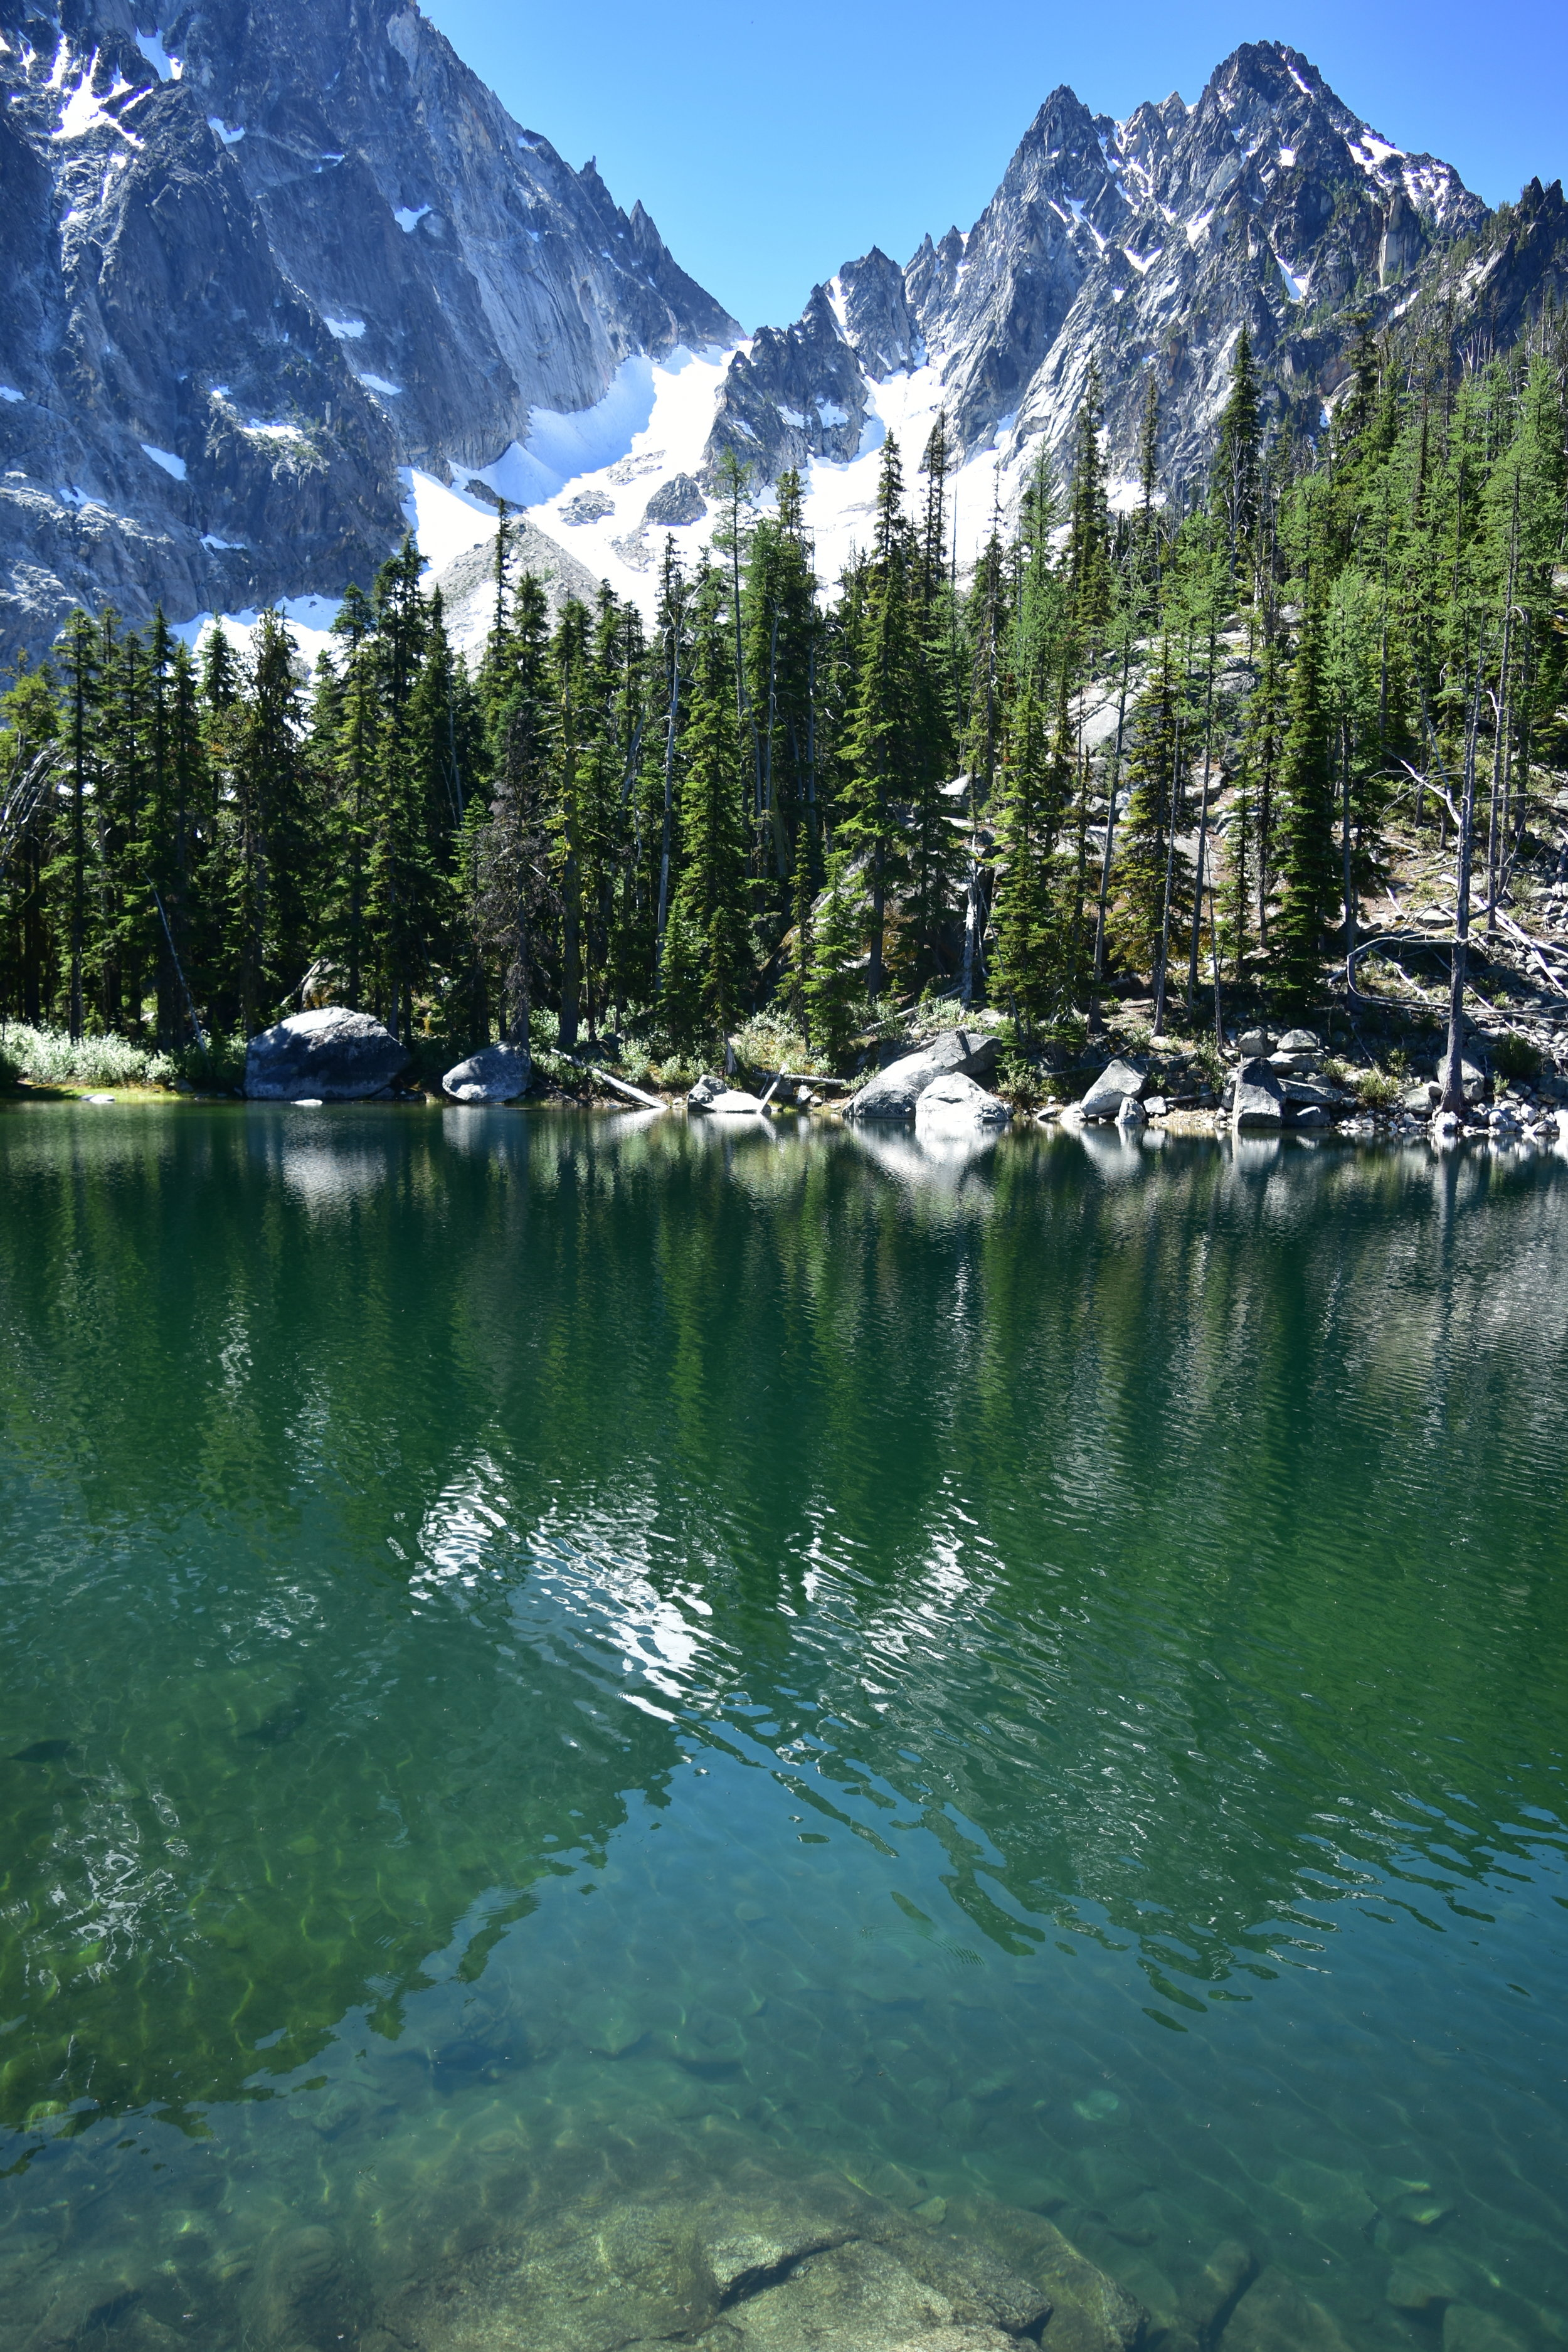 Lake Colchuck and Mount Colchuck